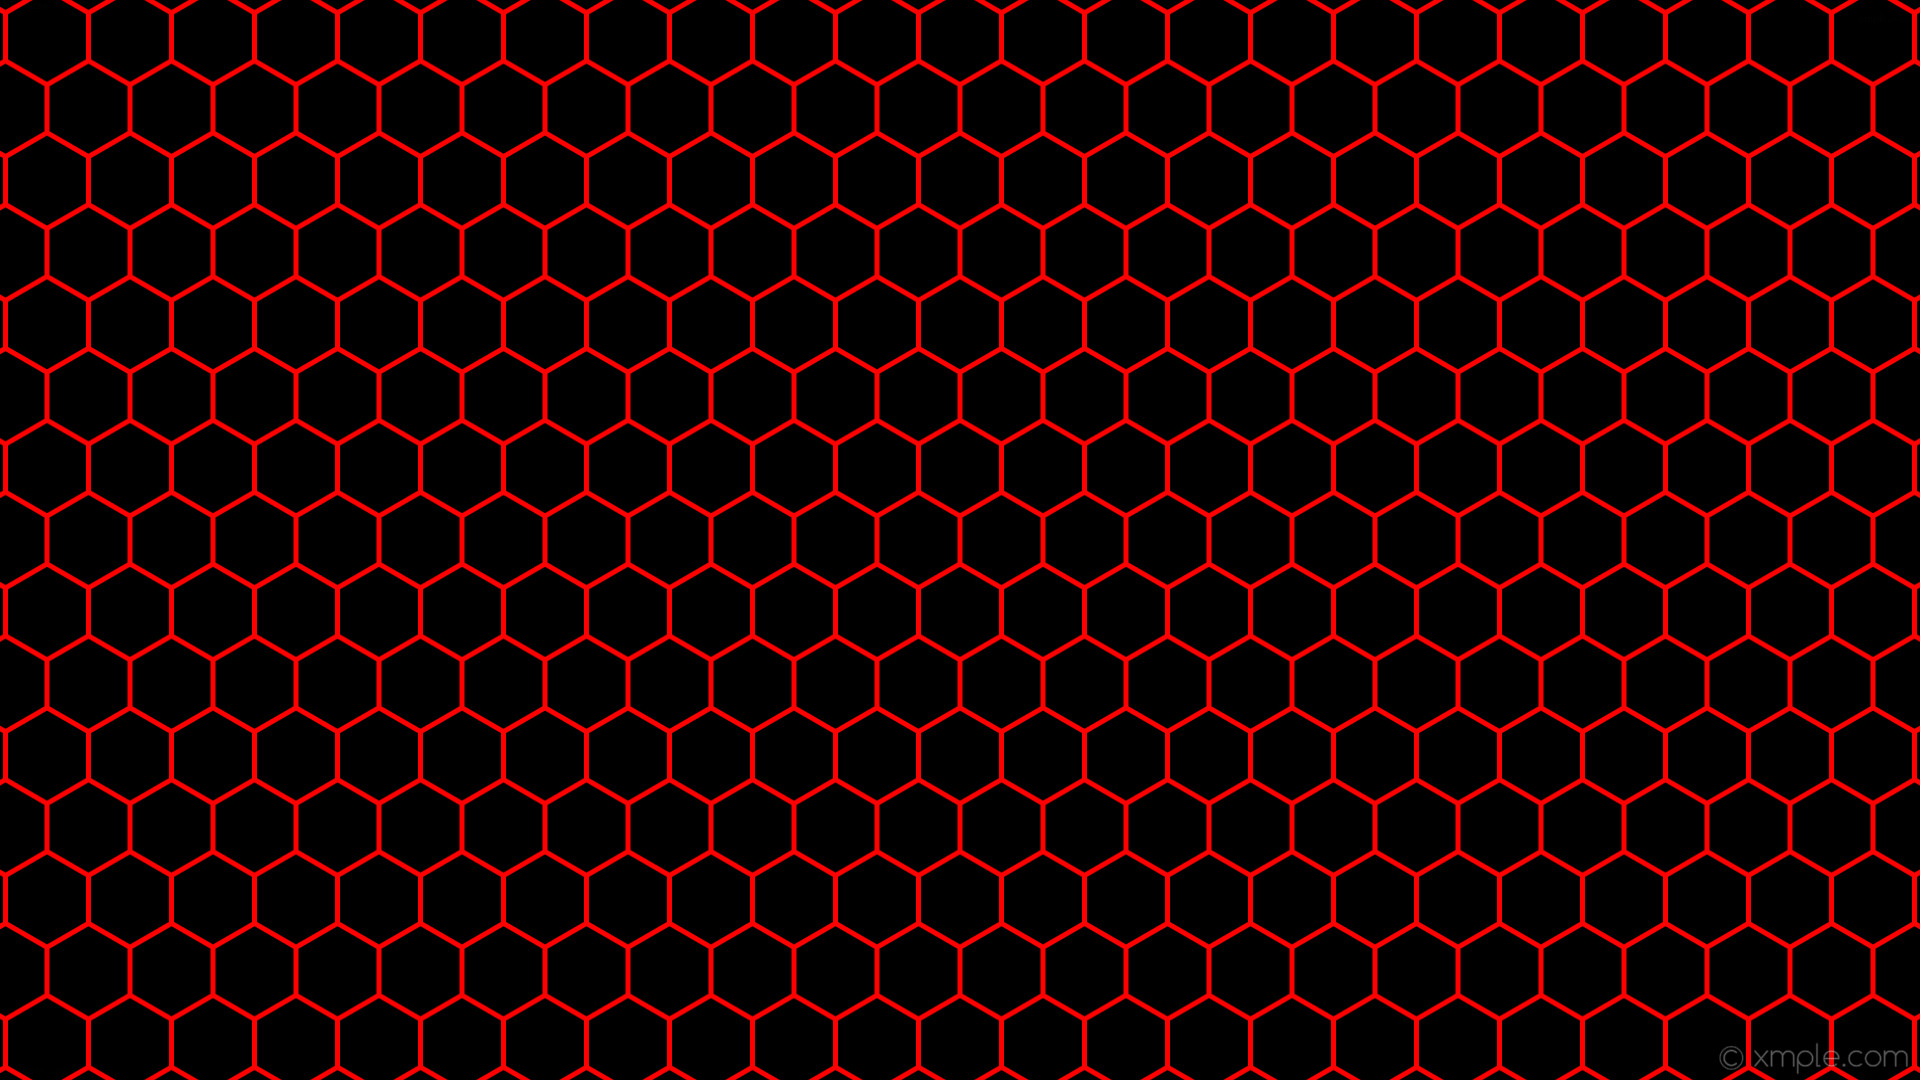 wallpaper beehive red black hexagon honeycomb #000000 #ff0000 0° 5px 83px